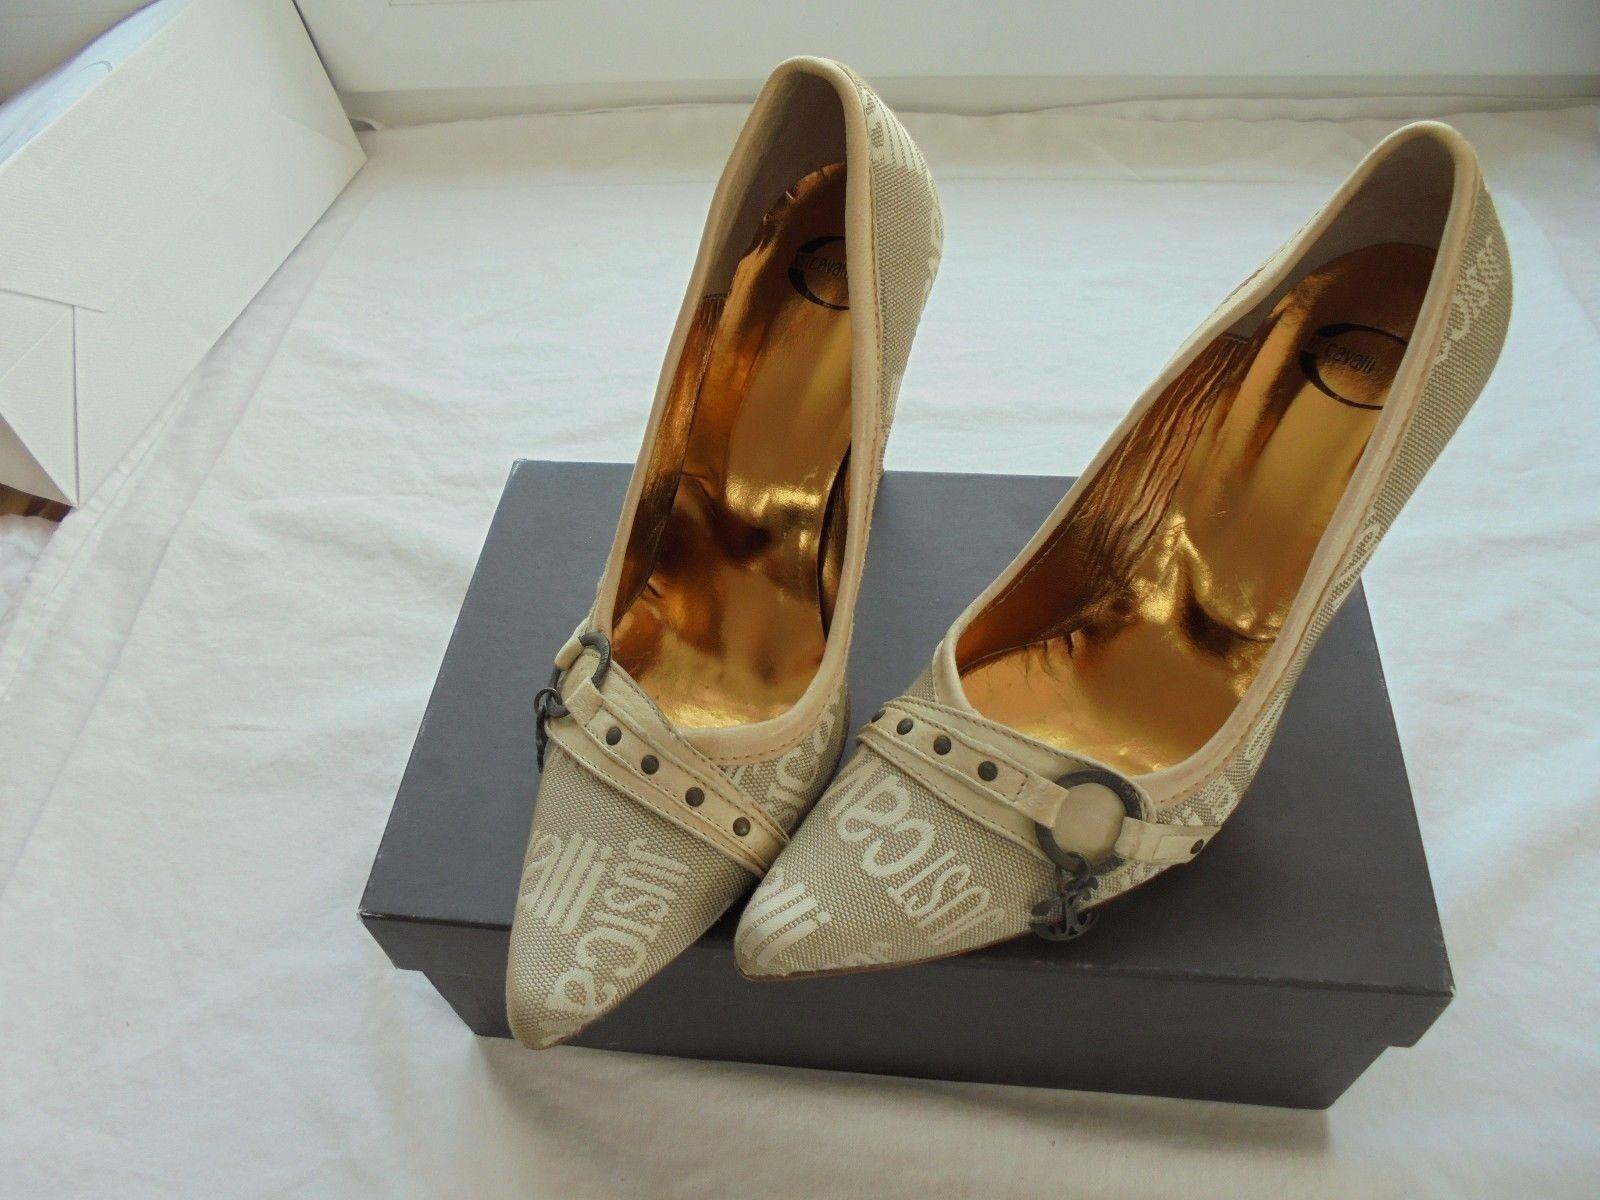 Just Cavalli Pumps NP:  + OVP High Heels Luxus Schuhe Designer Schuhe Luxus Gr. 39 f84489